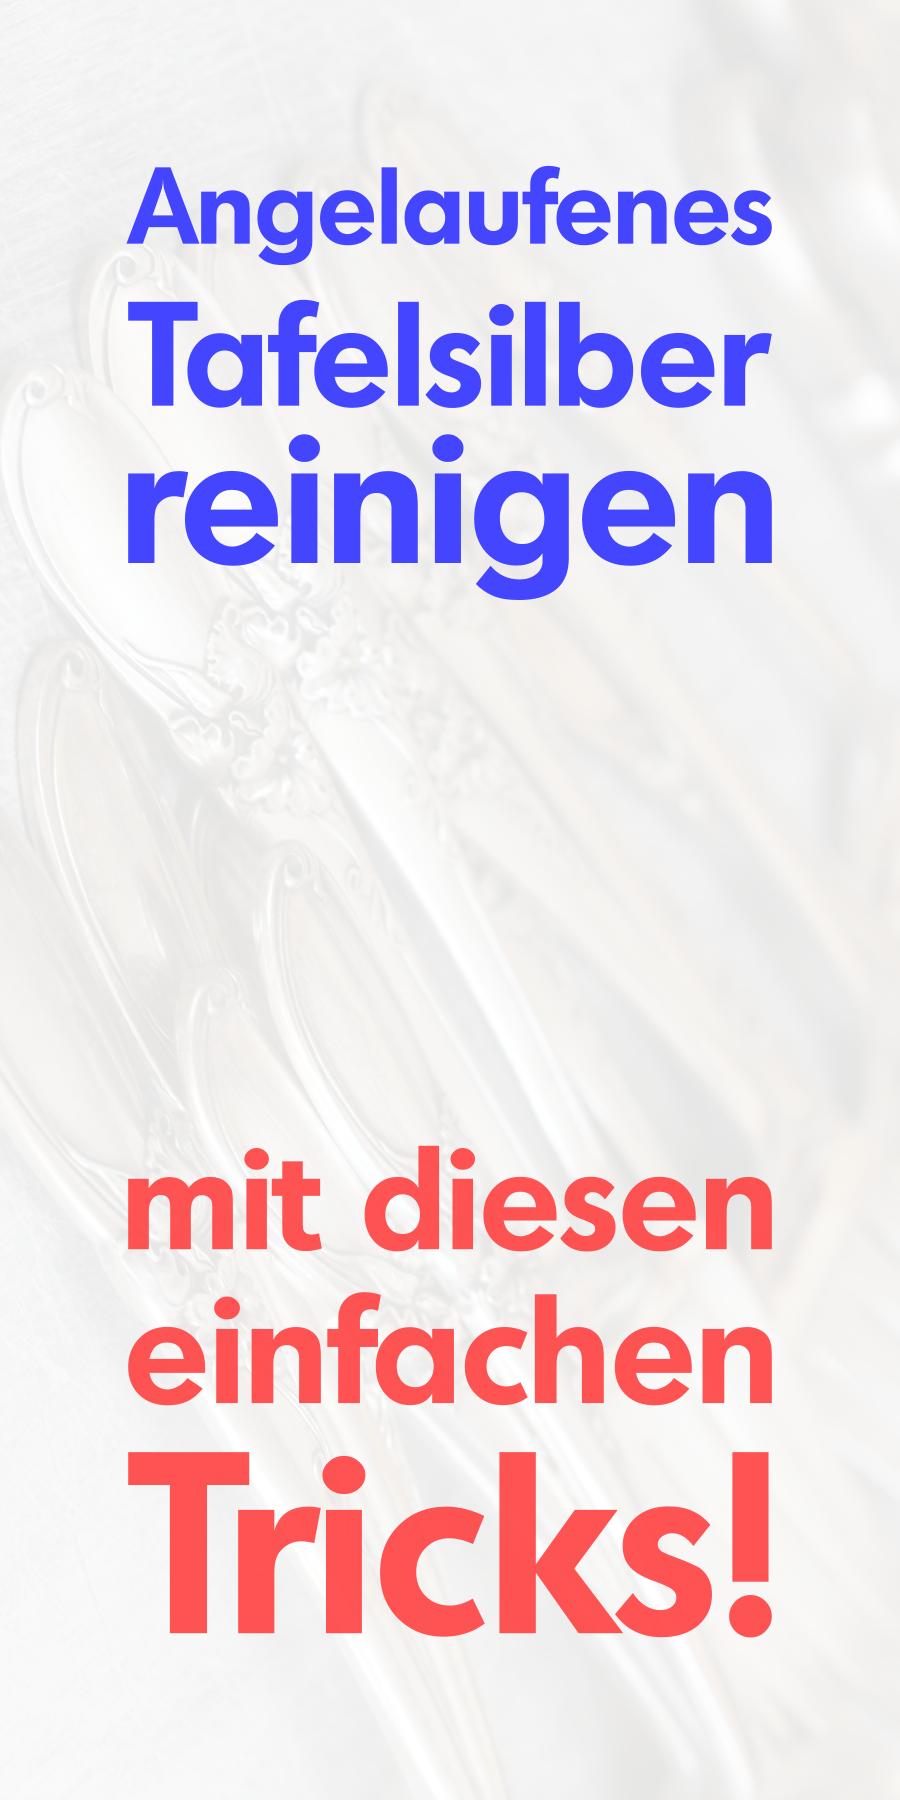 Besteck Aus Silber Reinigen Wie Du Angelaufenes Tafelsilber Fix Wieder Glänzen Lässt